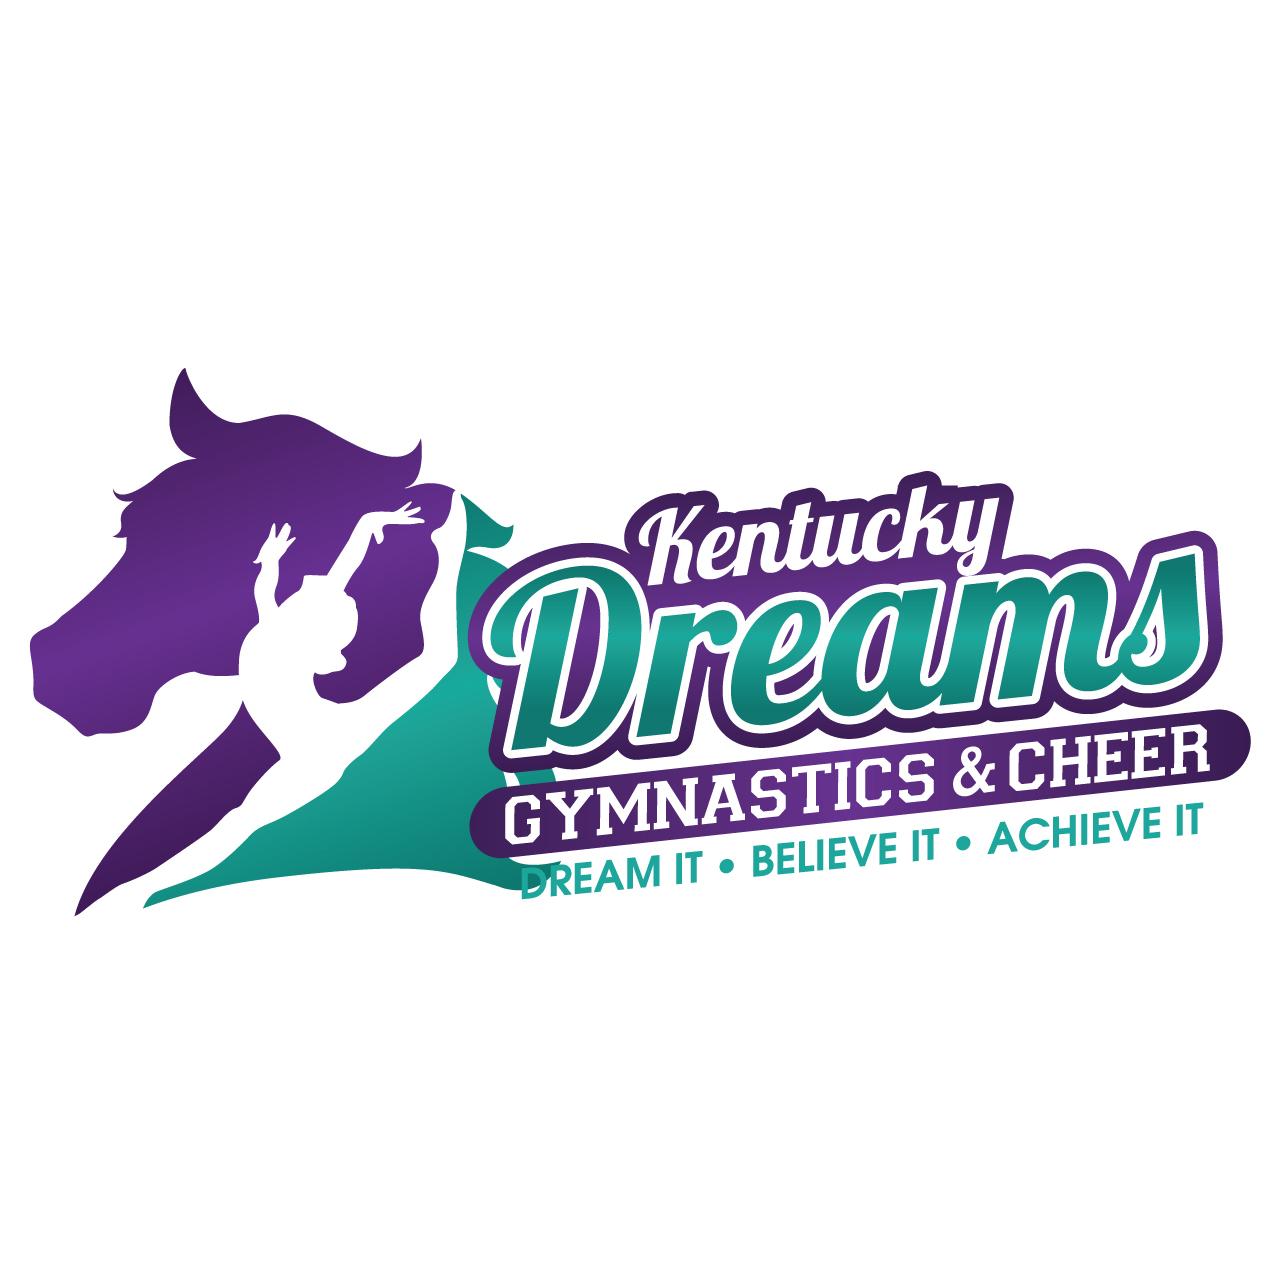 Kentucky Dreams Gymnastics and Cheer